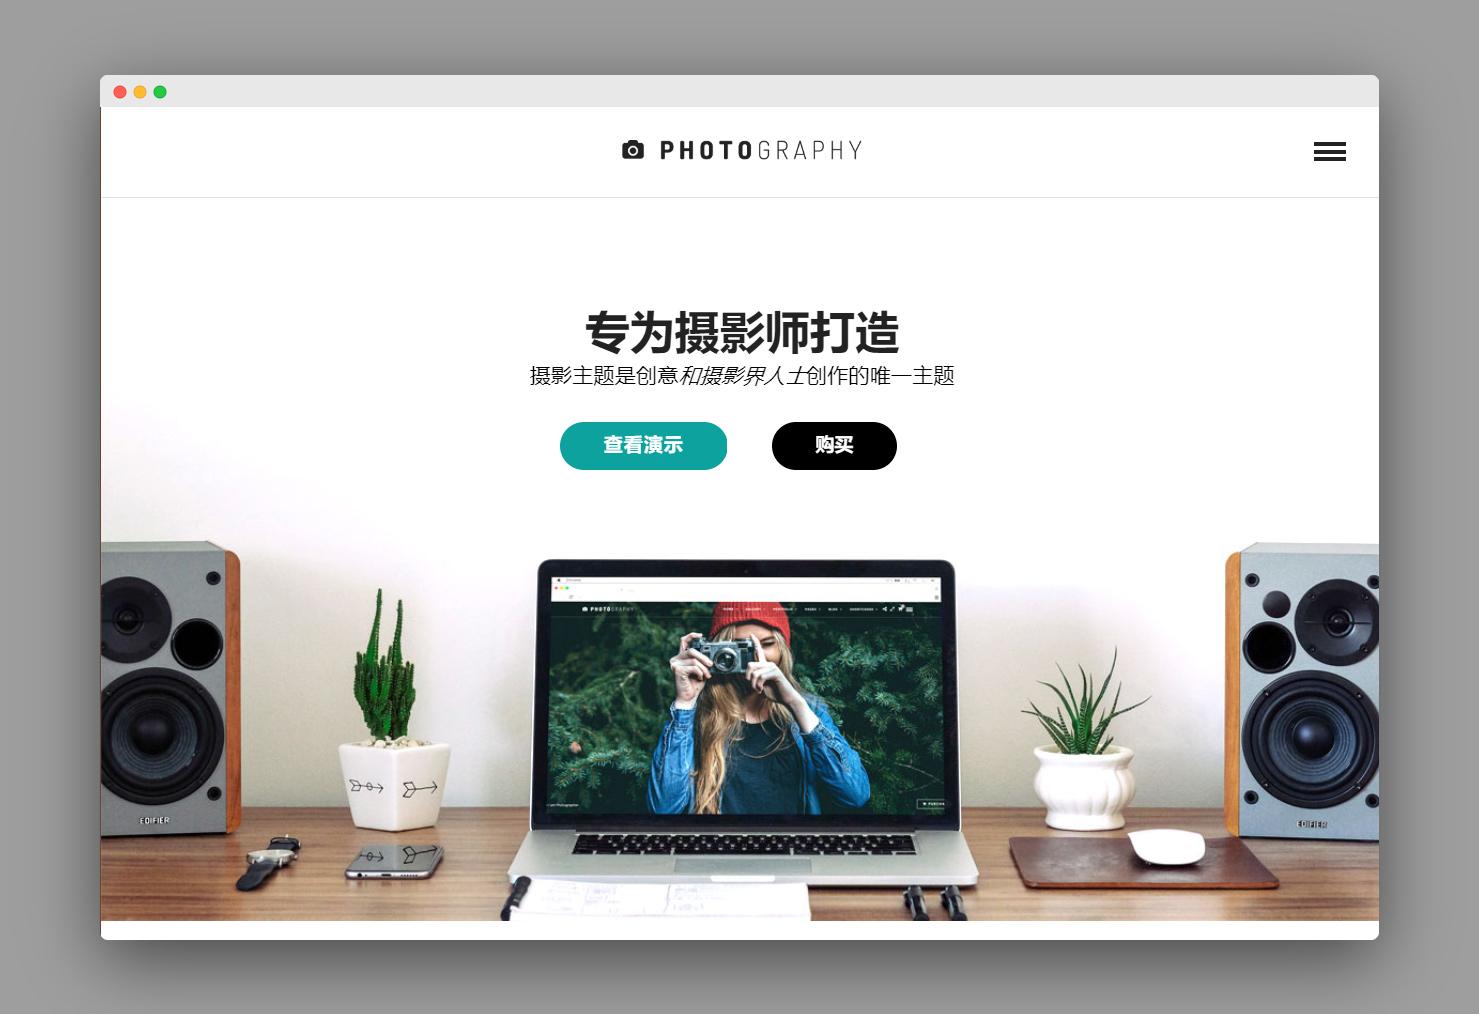 Photography v6.4.1主题 最新无授权WordPress智能响应式网站拍摄相册图片网站模版源代码